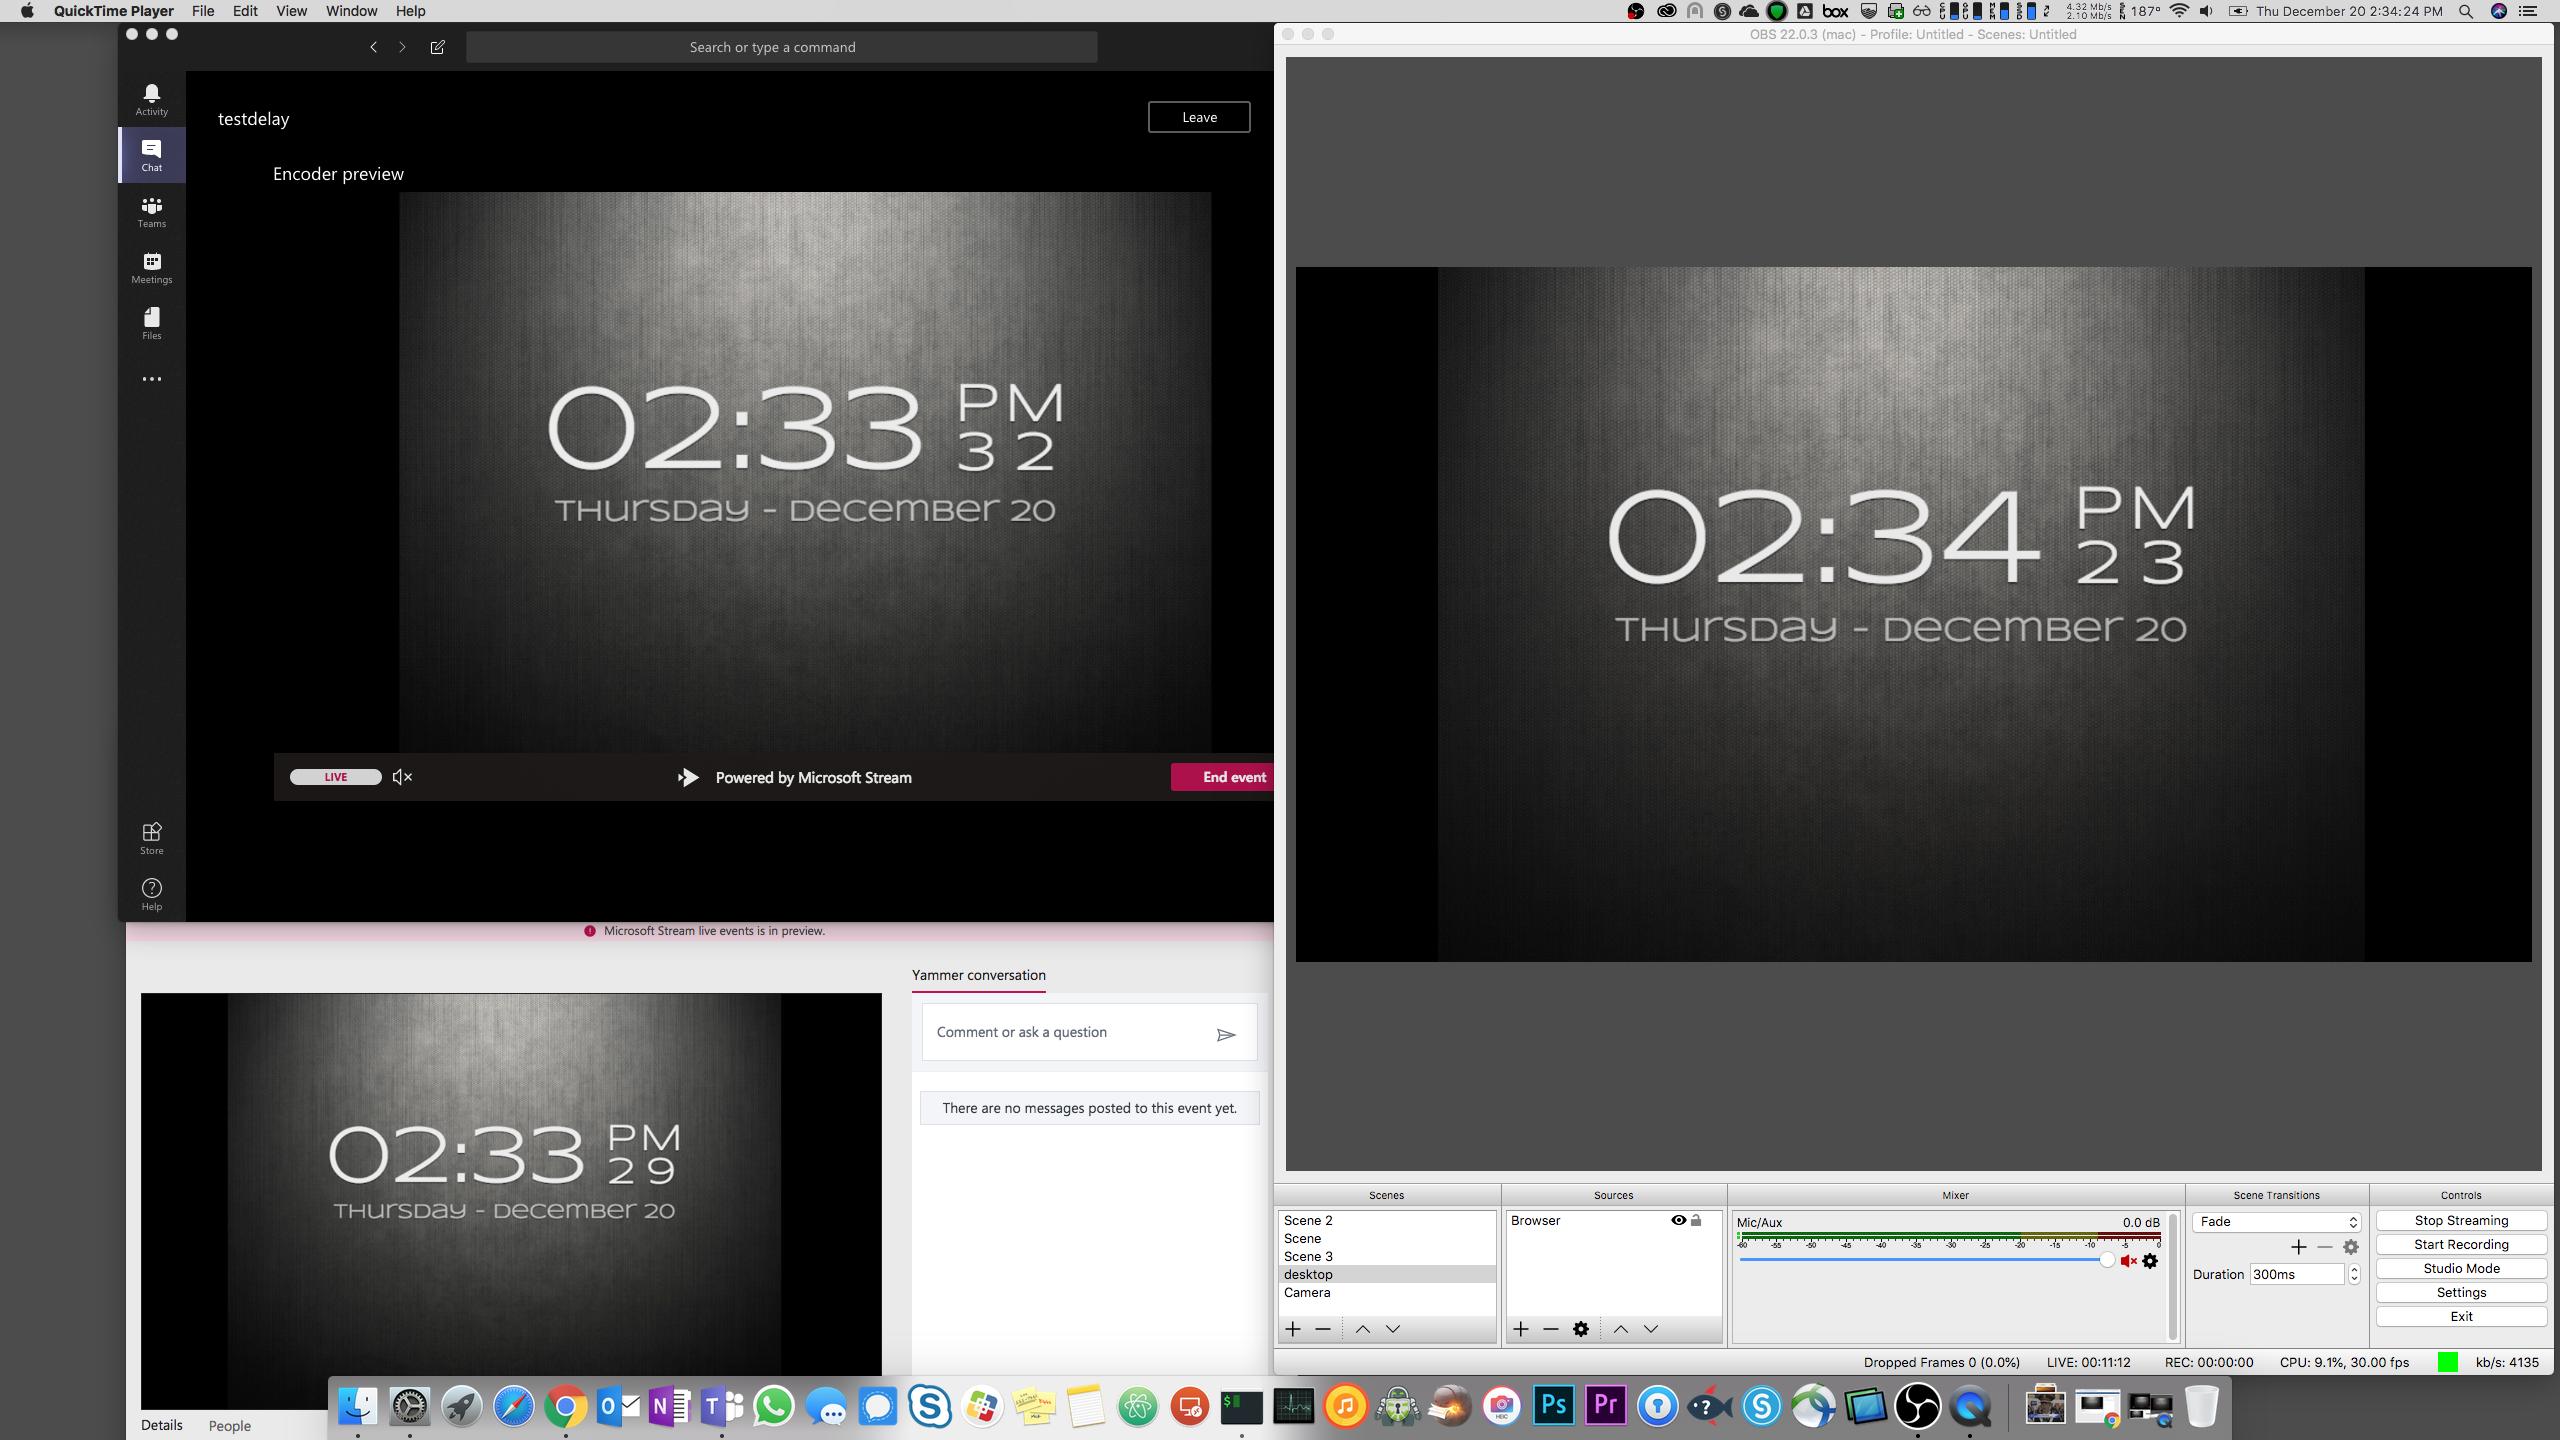 Stream Live Event has a 50 second delay - Microsoft Tech Community